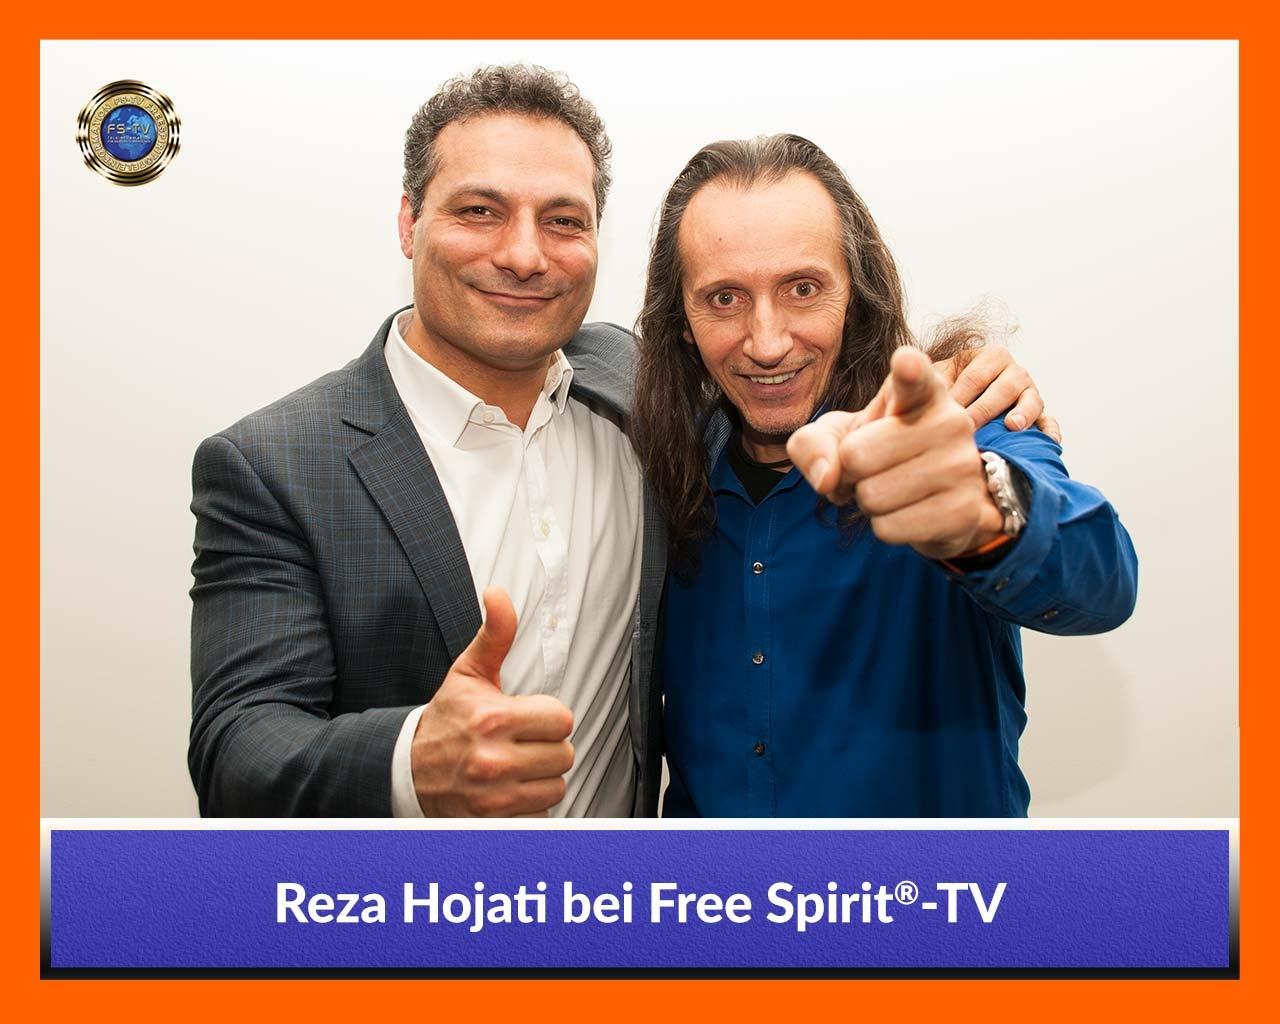 Reza-Hojati-05